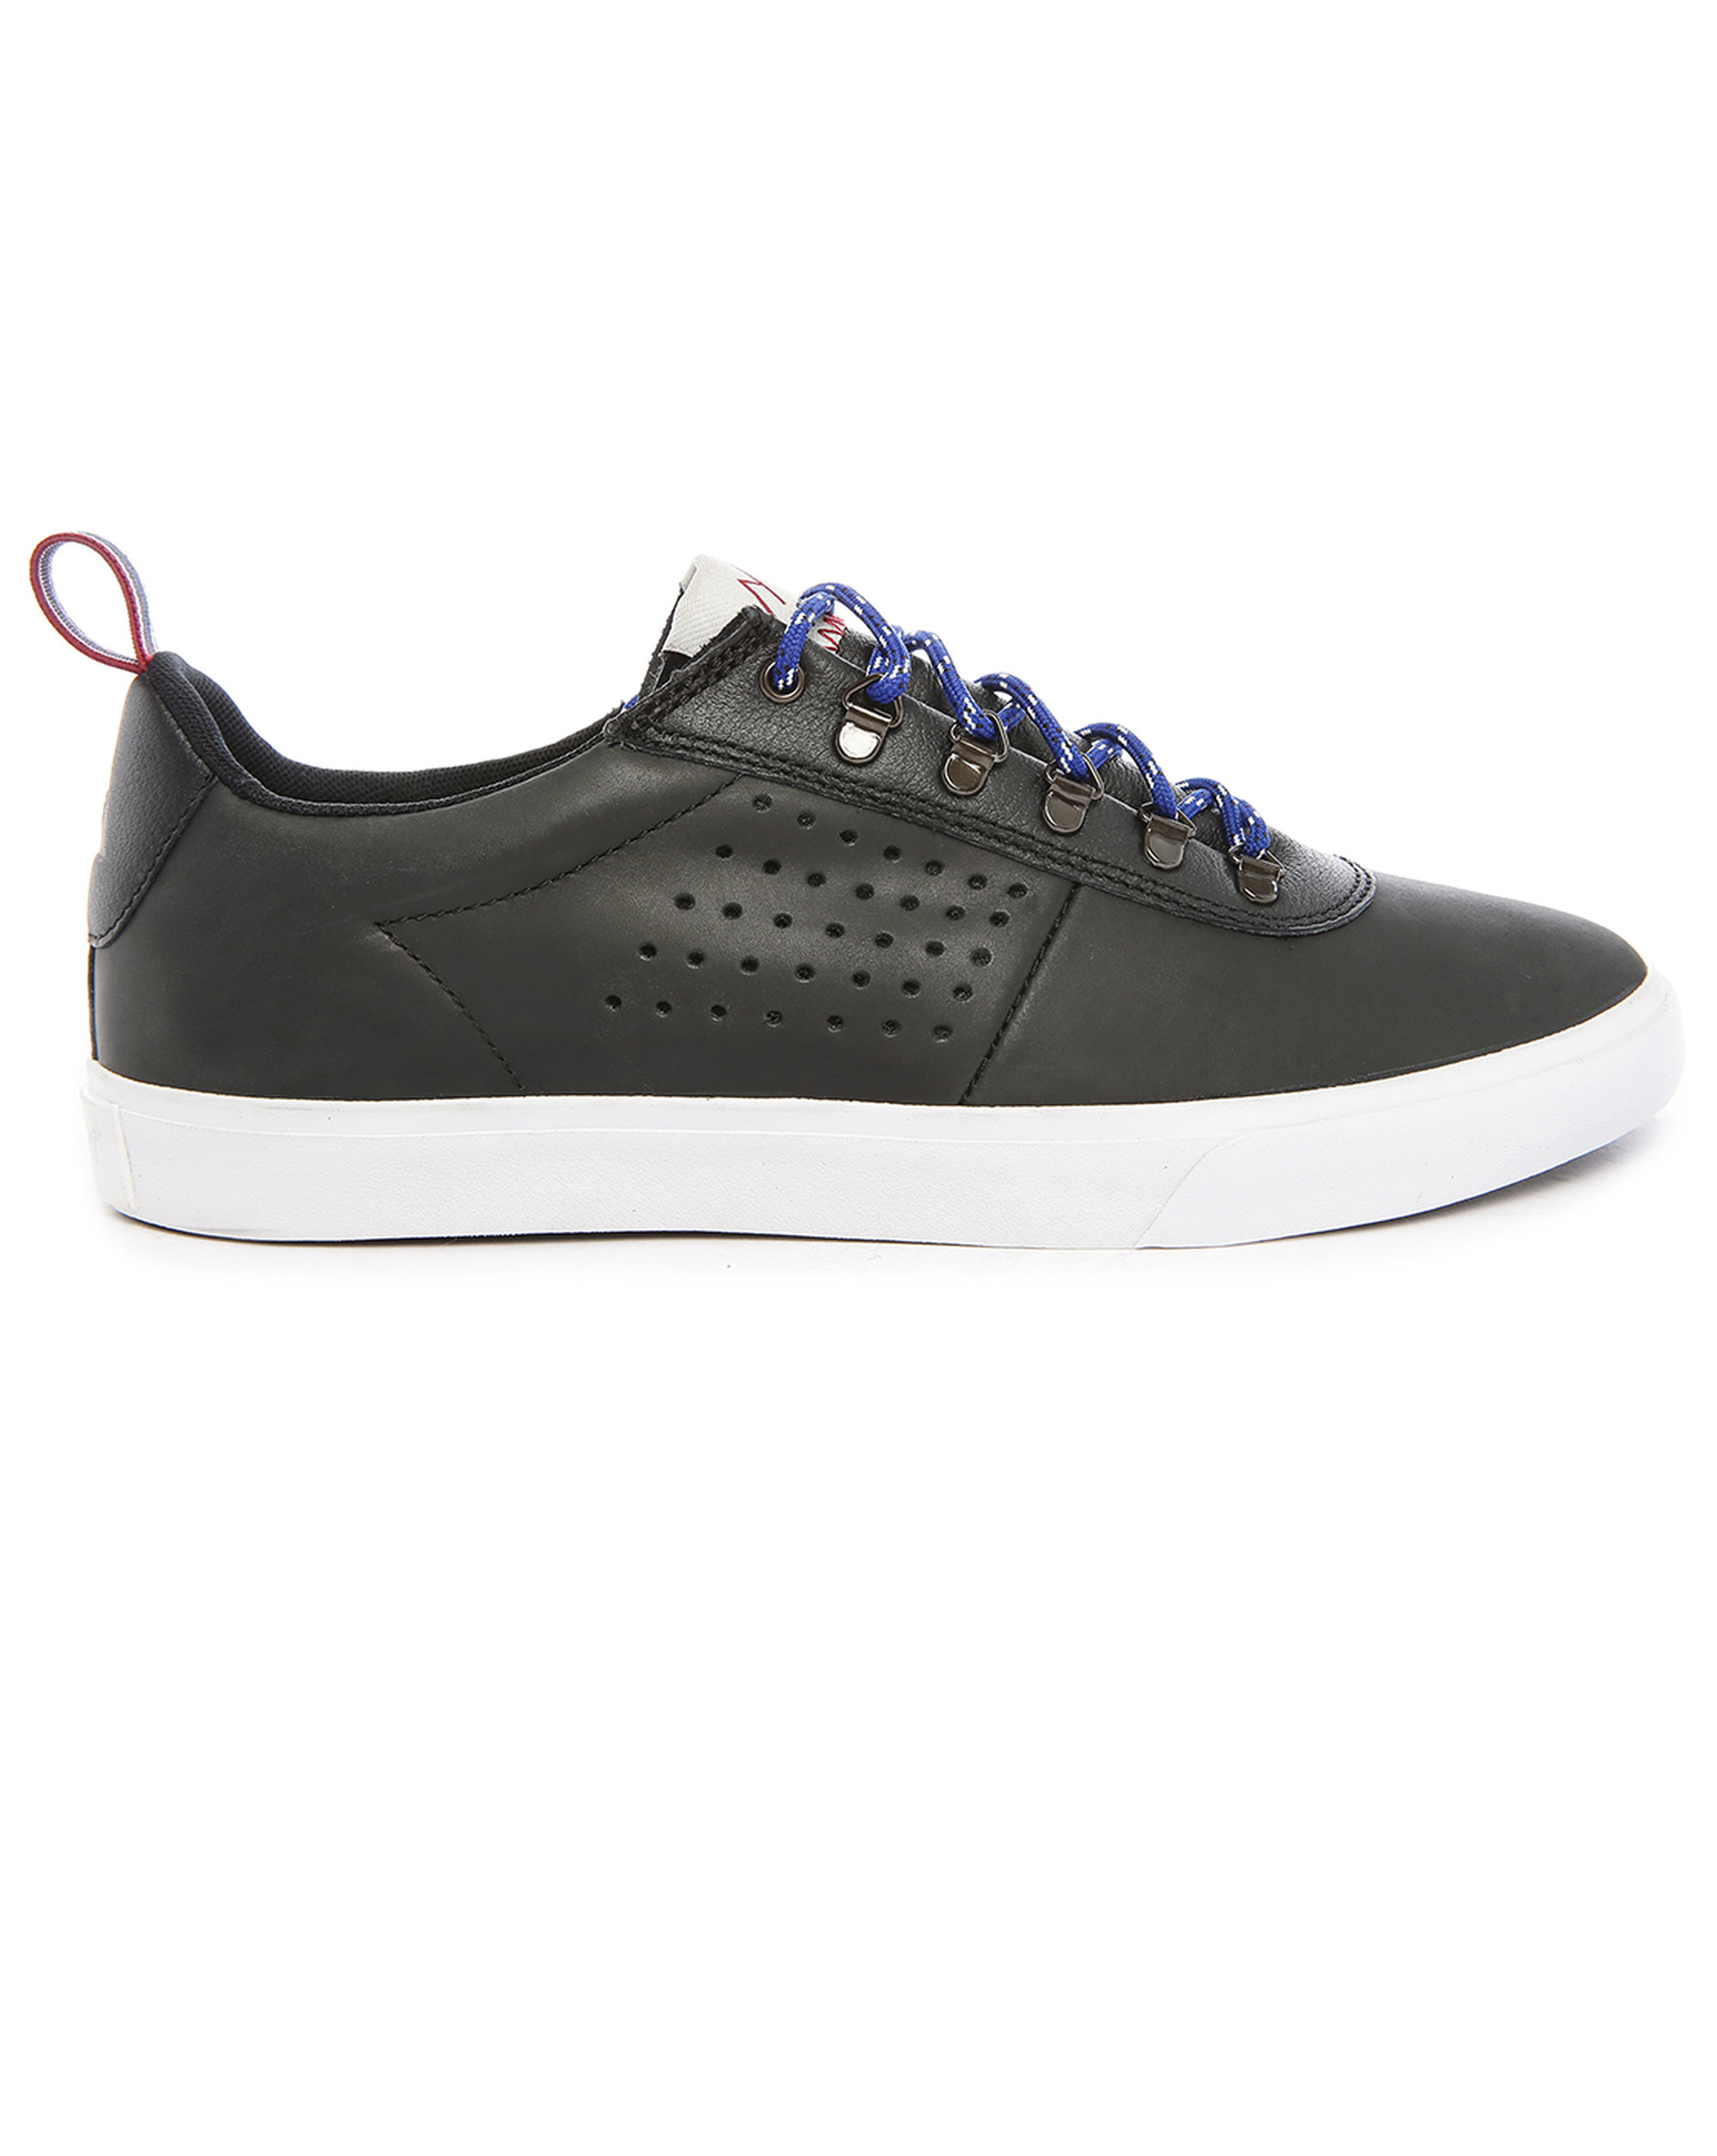 le coq sportif mont butchau black leather sneakers in